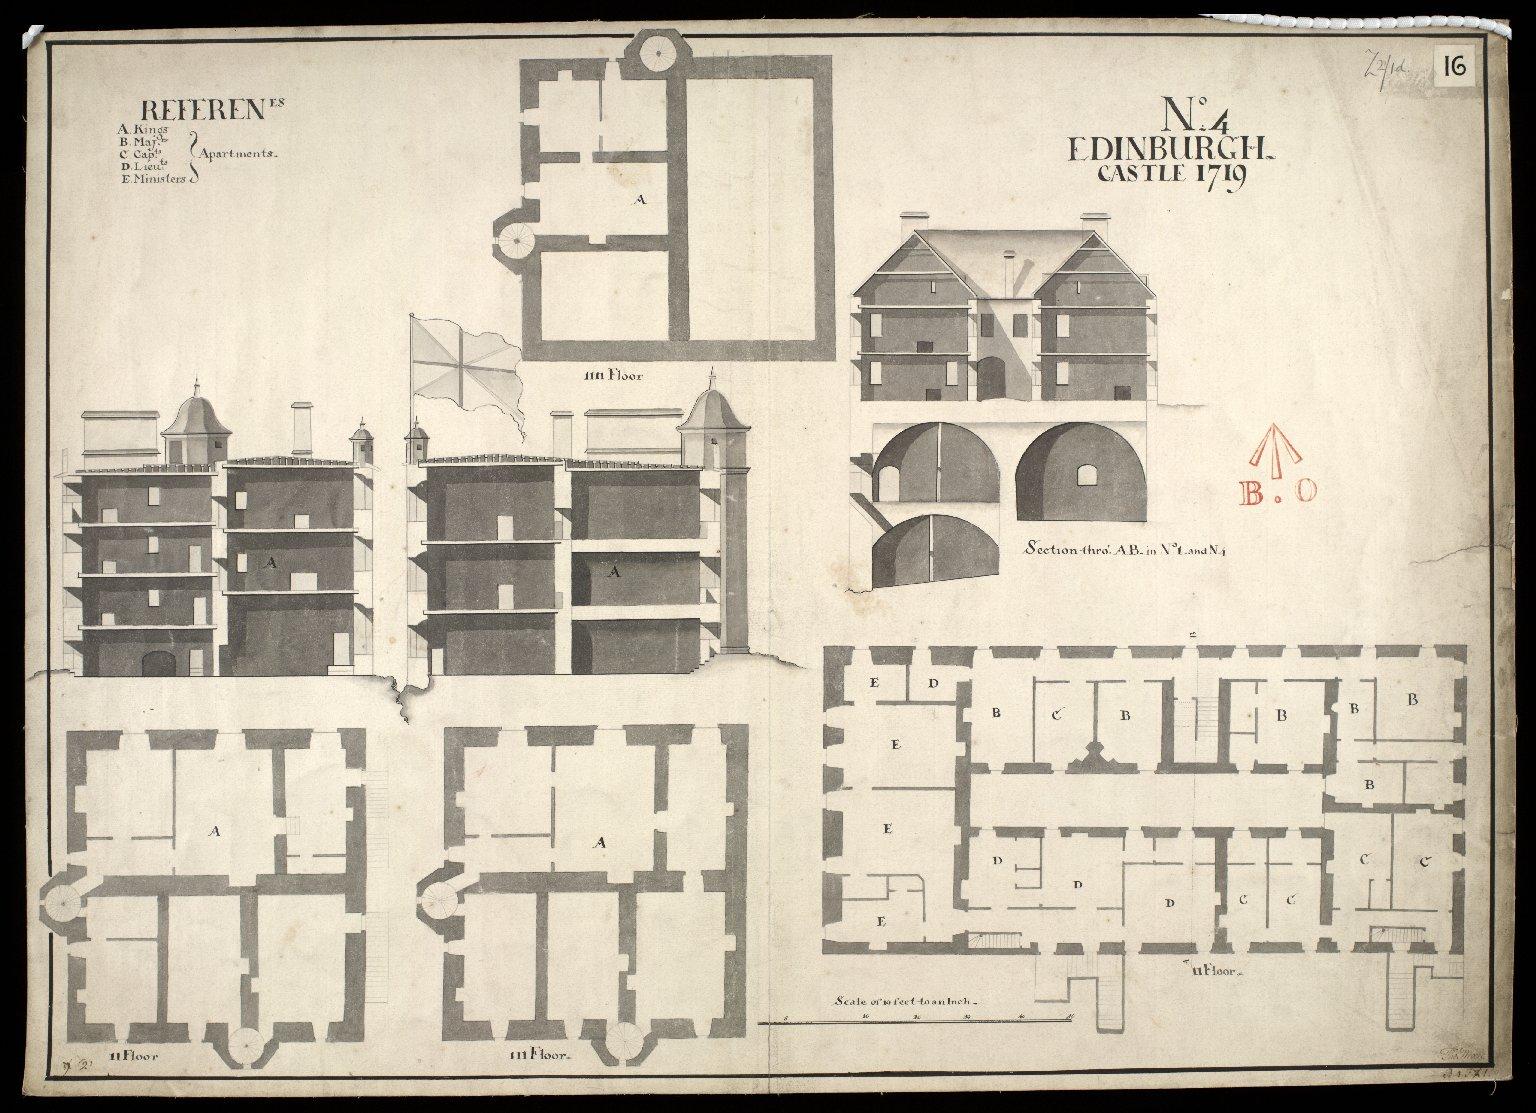 Edinburgh Castle, No. 4, 1719 [1 of 1]